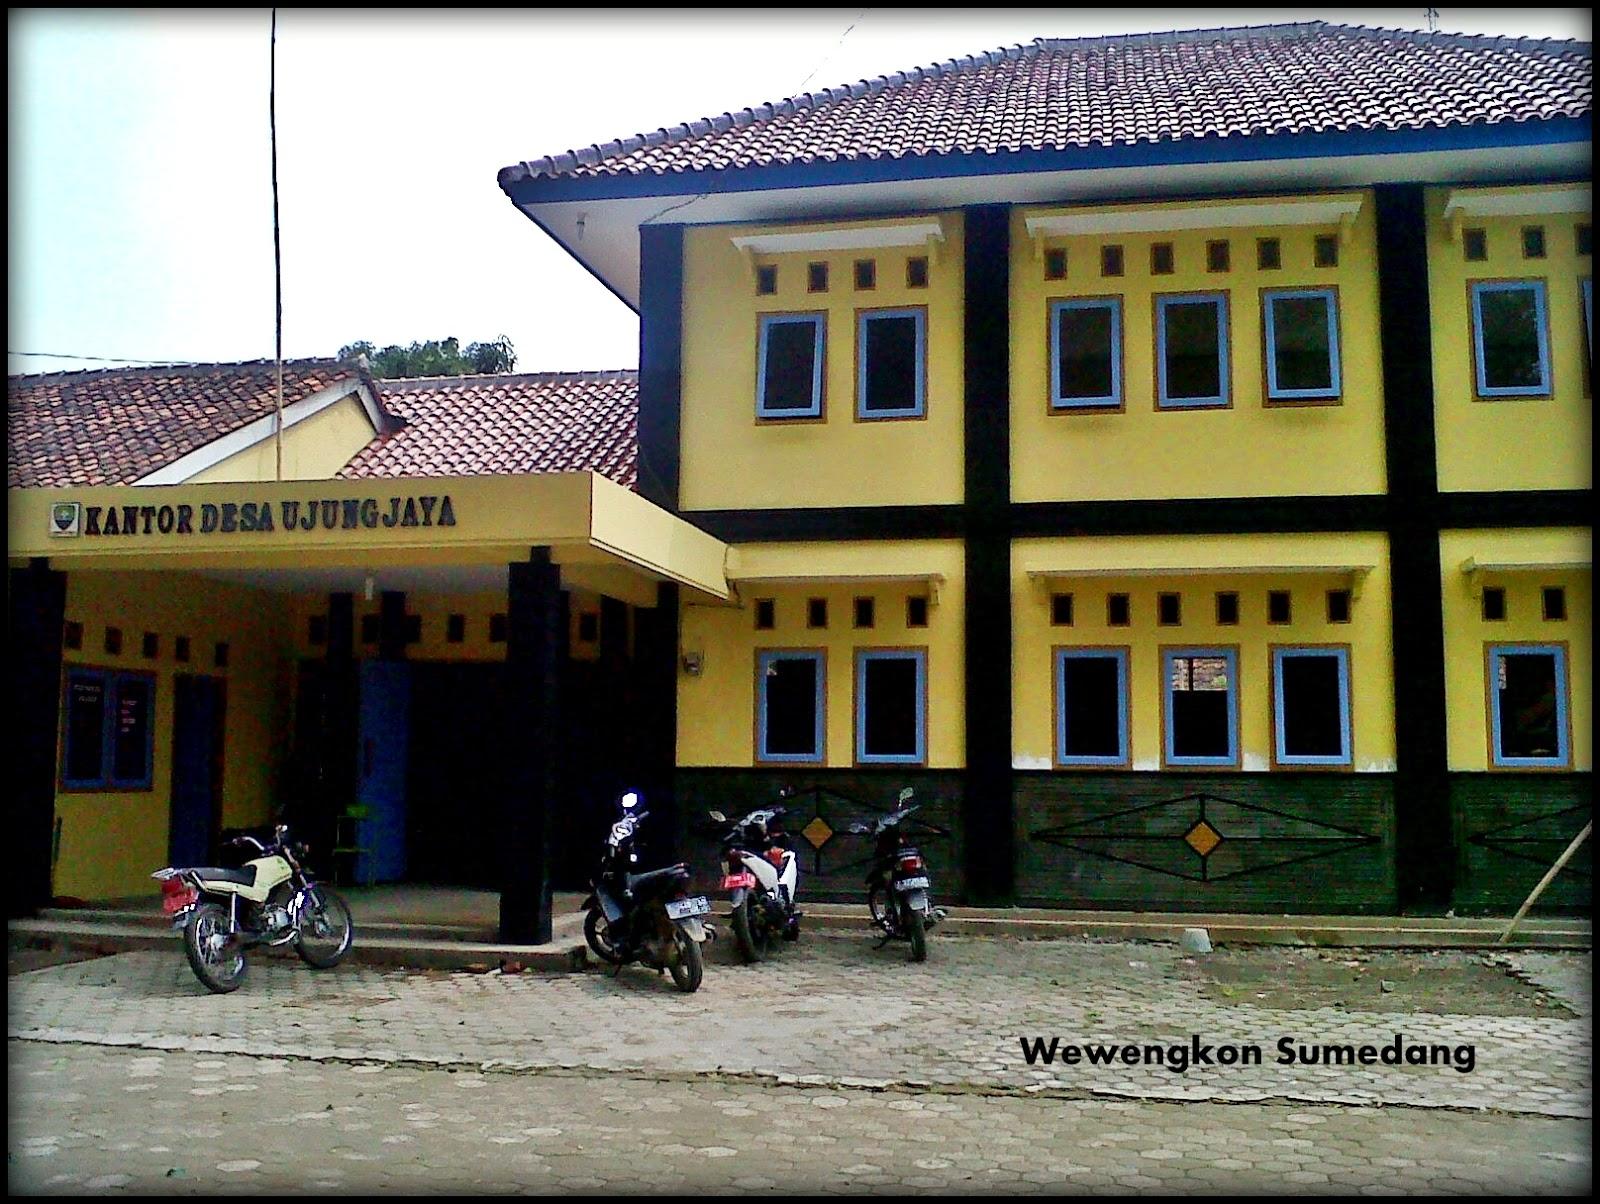 Kantor Desa Ujung Jaya, Kab. Sumedang